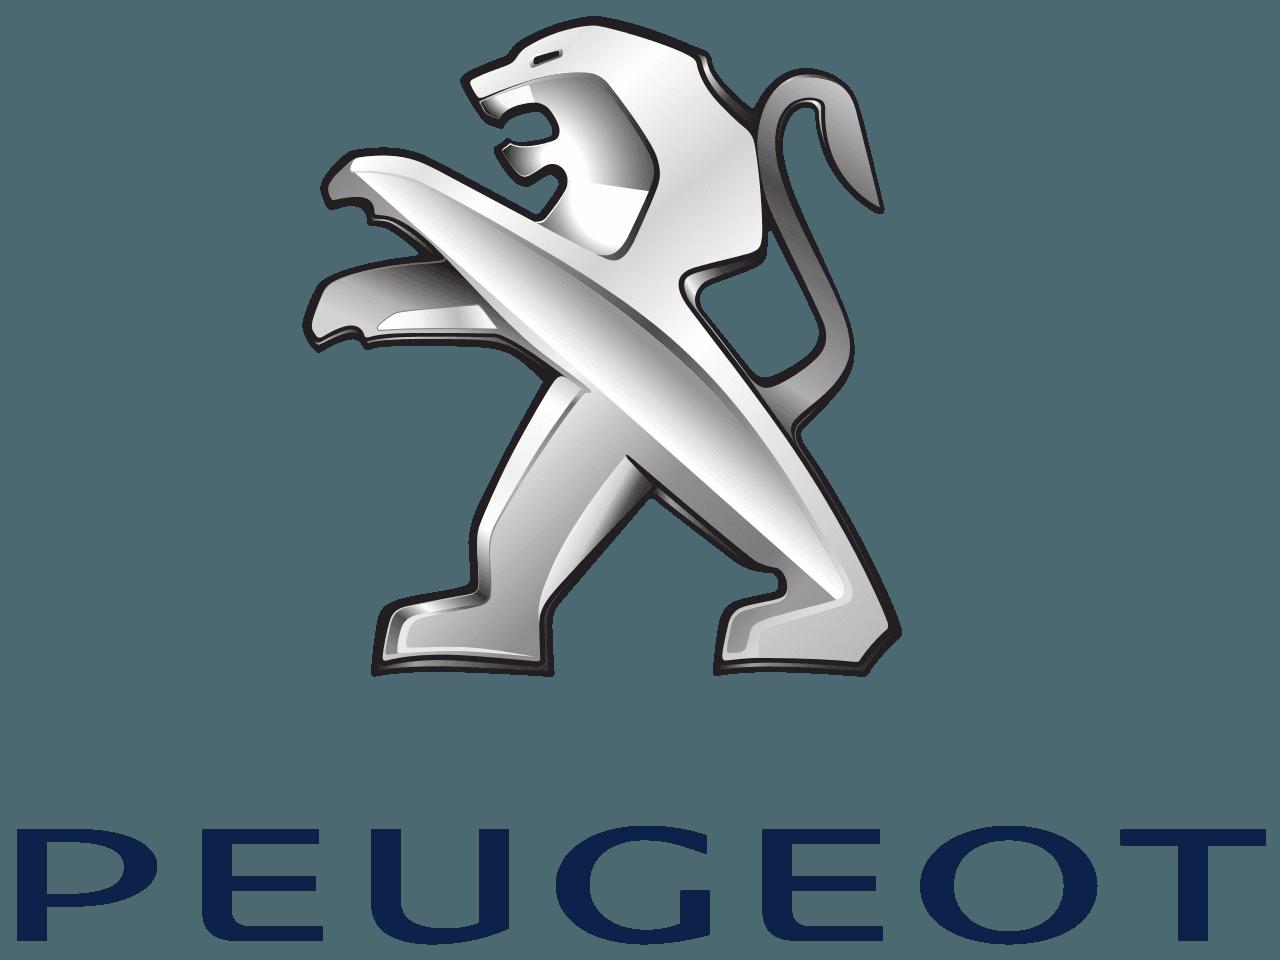 Peugeot revisione cambi